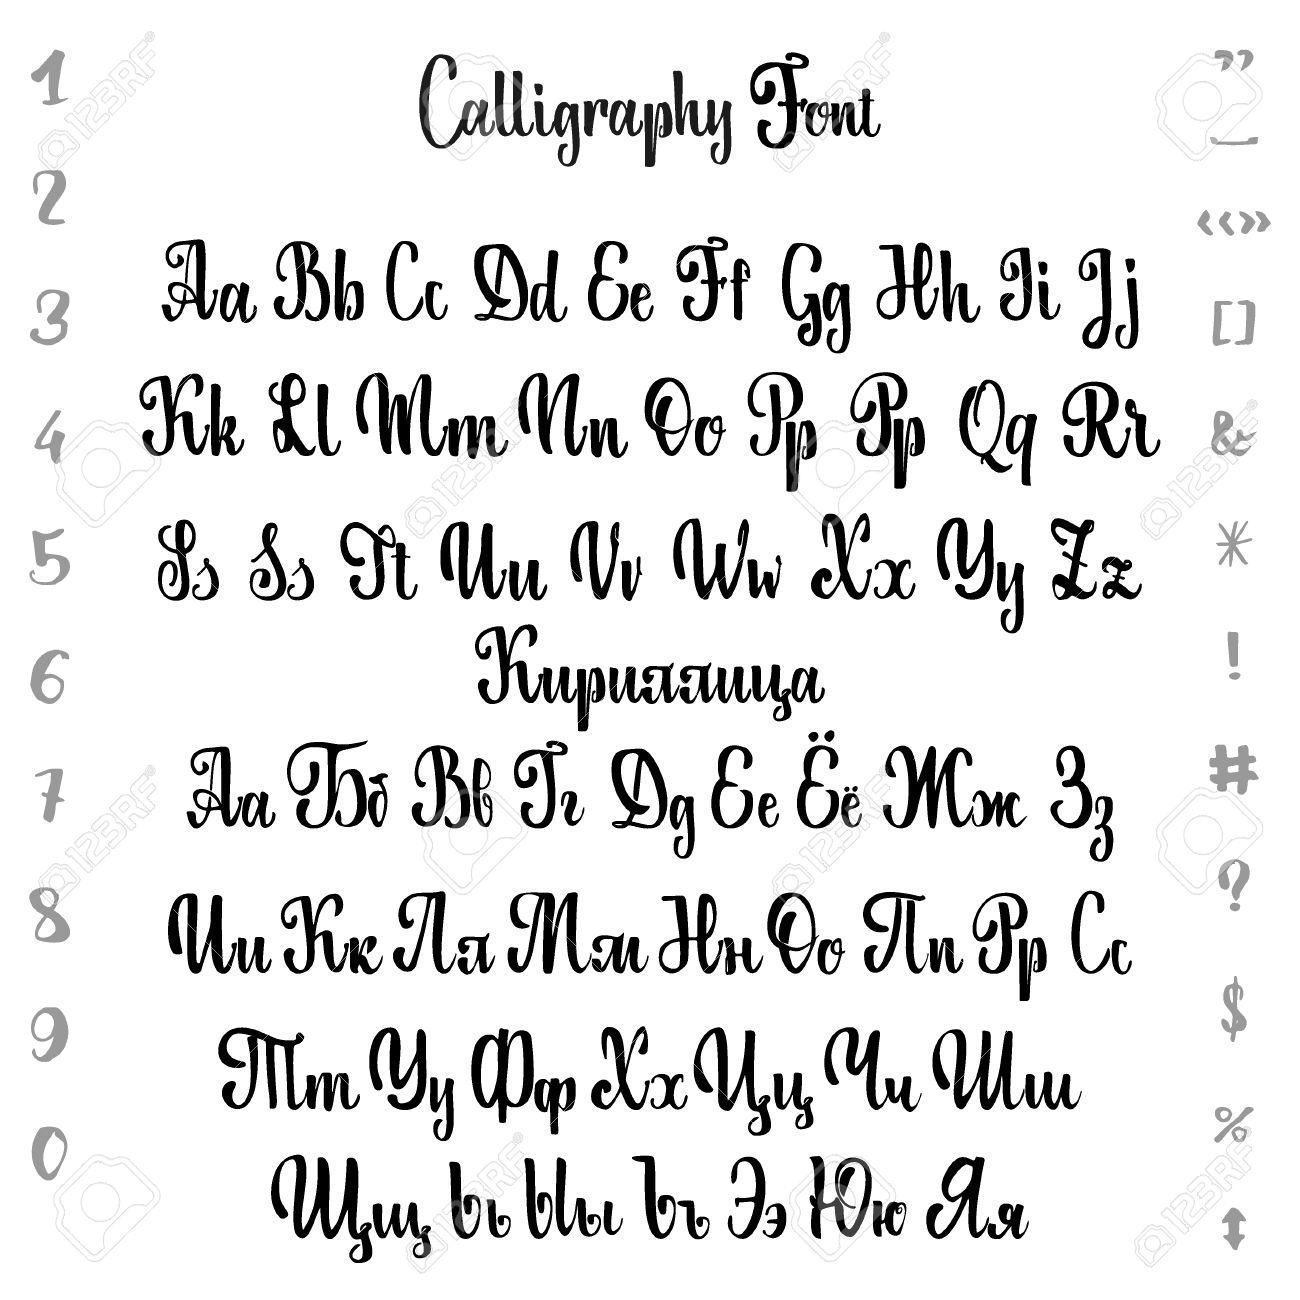 Font Drawn On The Basis Of Handwriting Calligraphy, Modern Cursive..